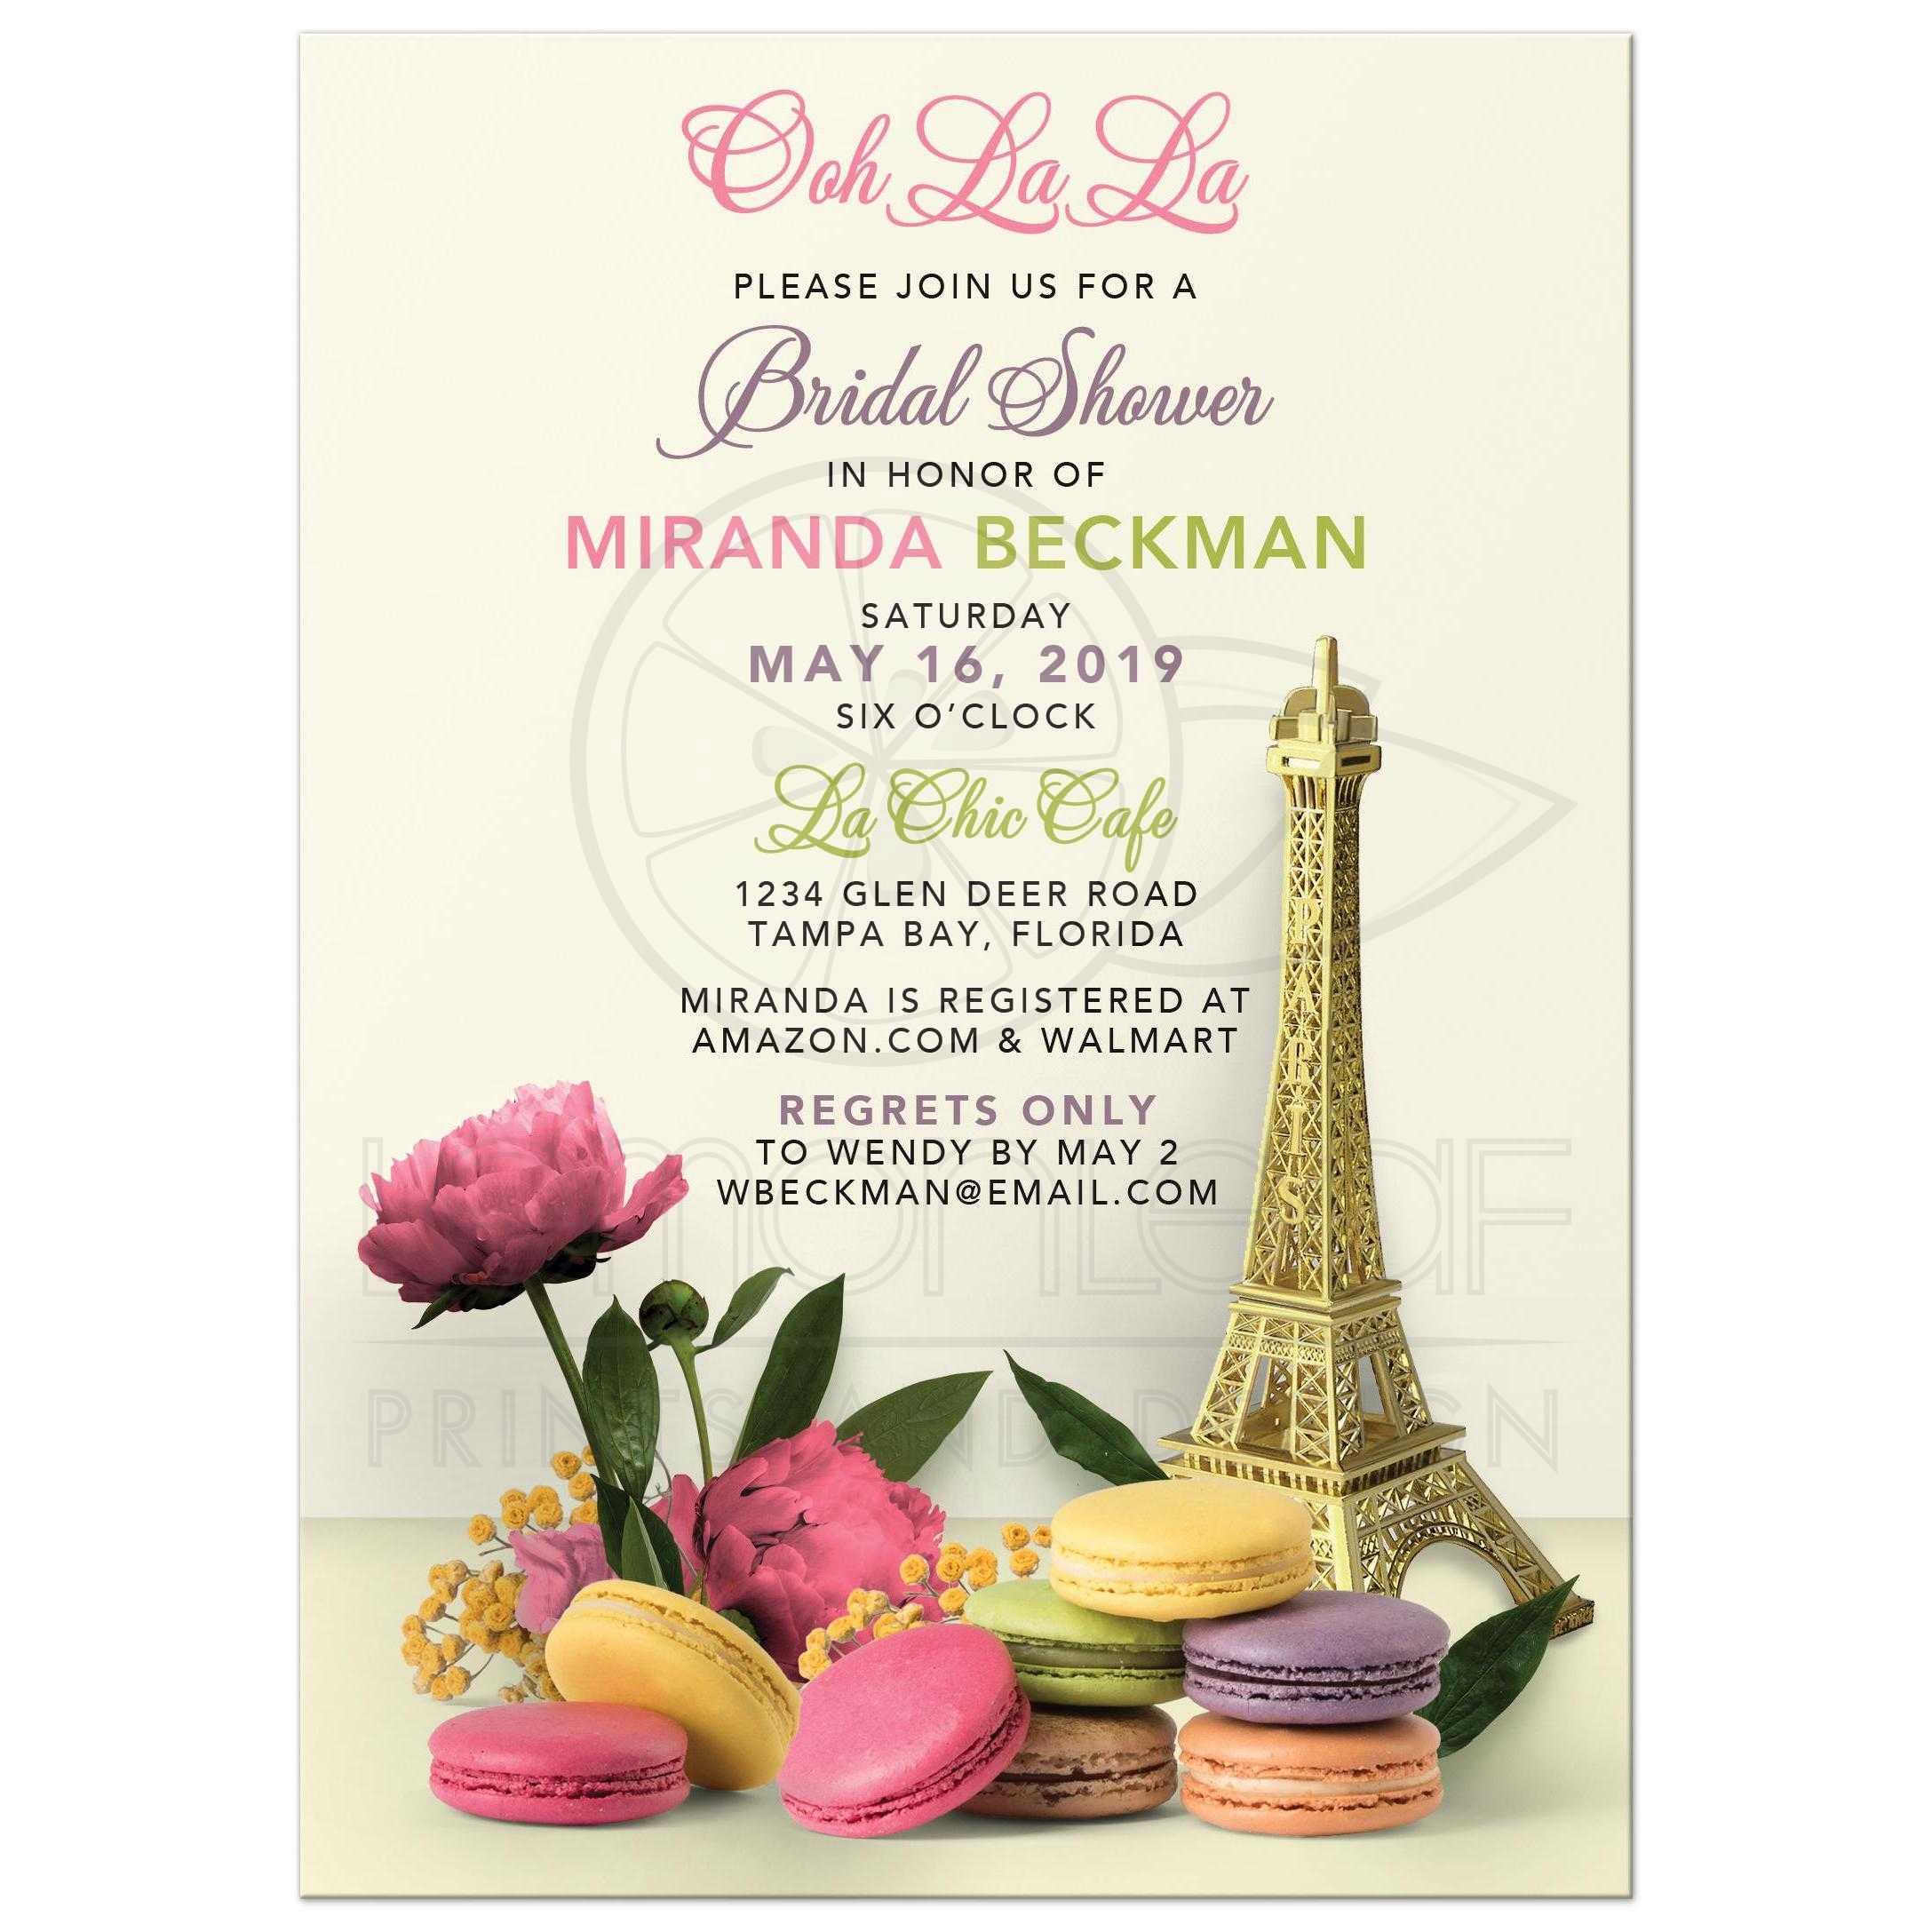 Parisian Paris Bridal Shower Invitation